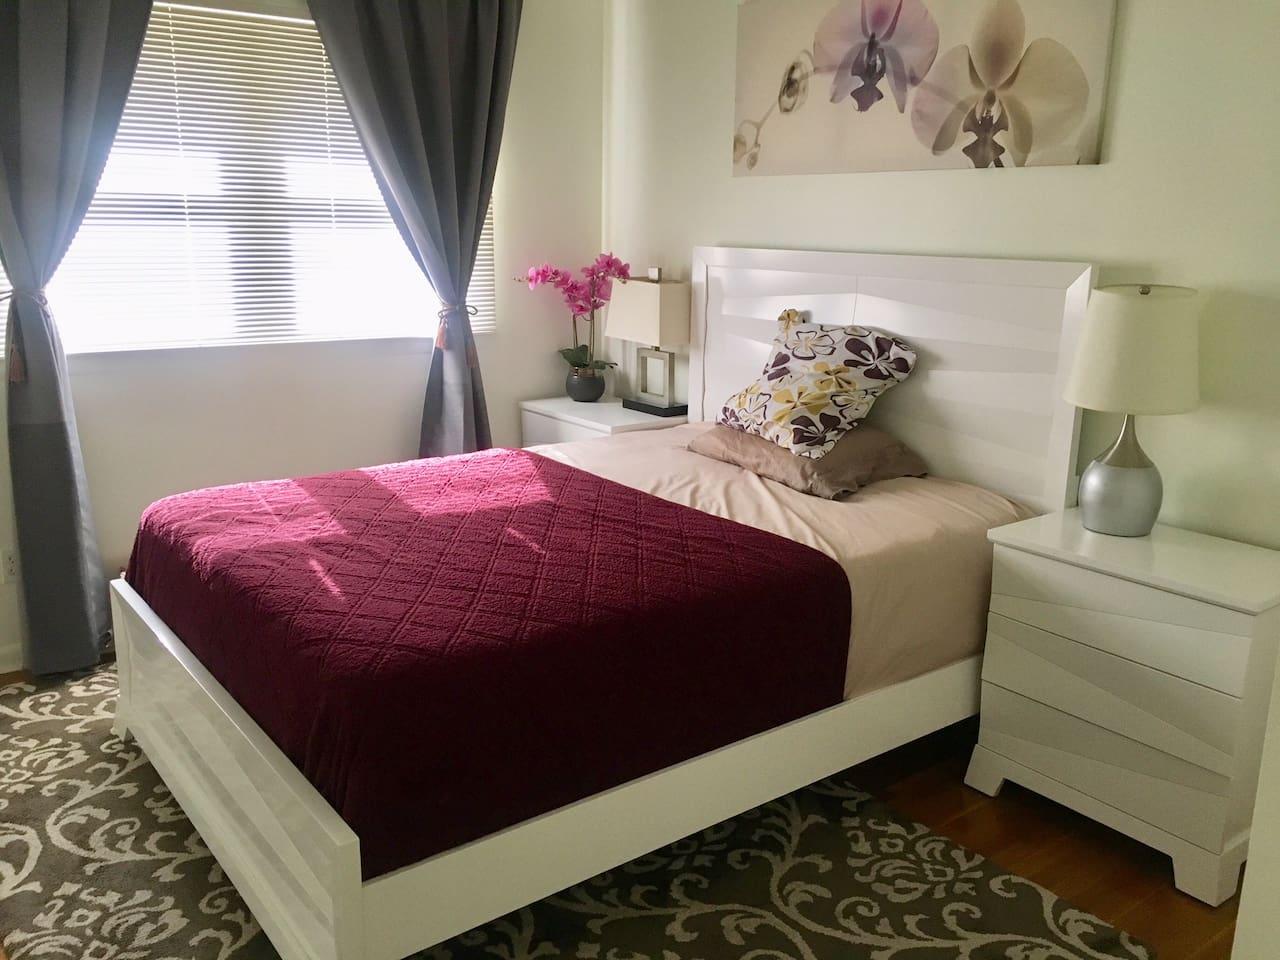 Hosting guest room